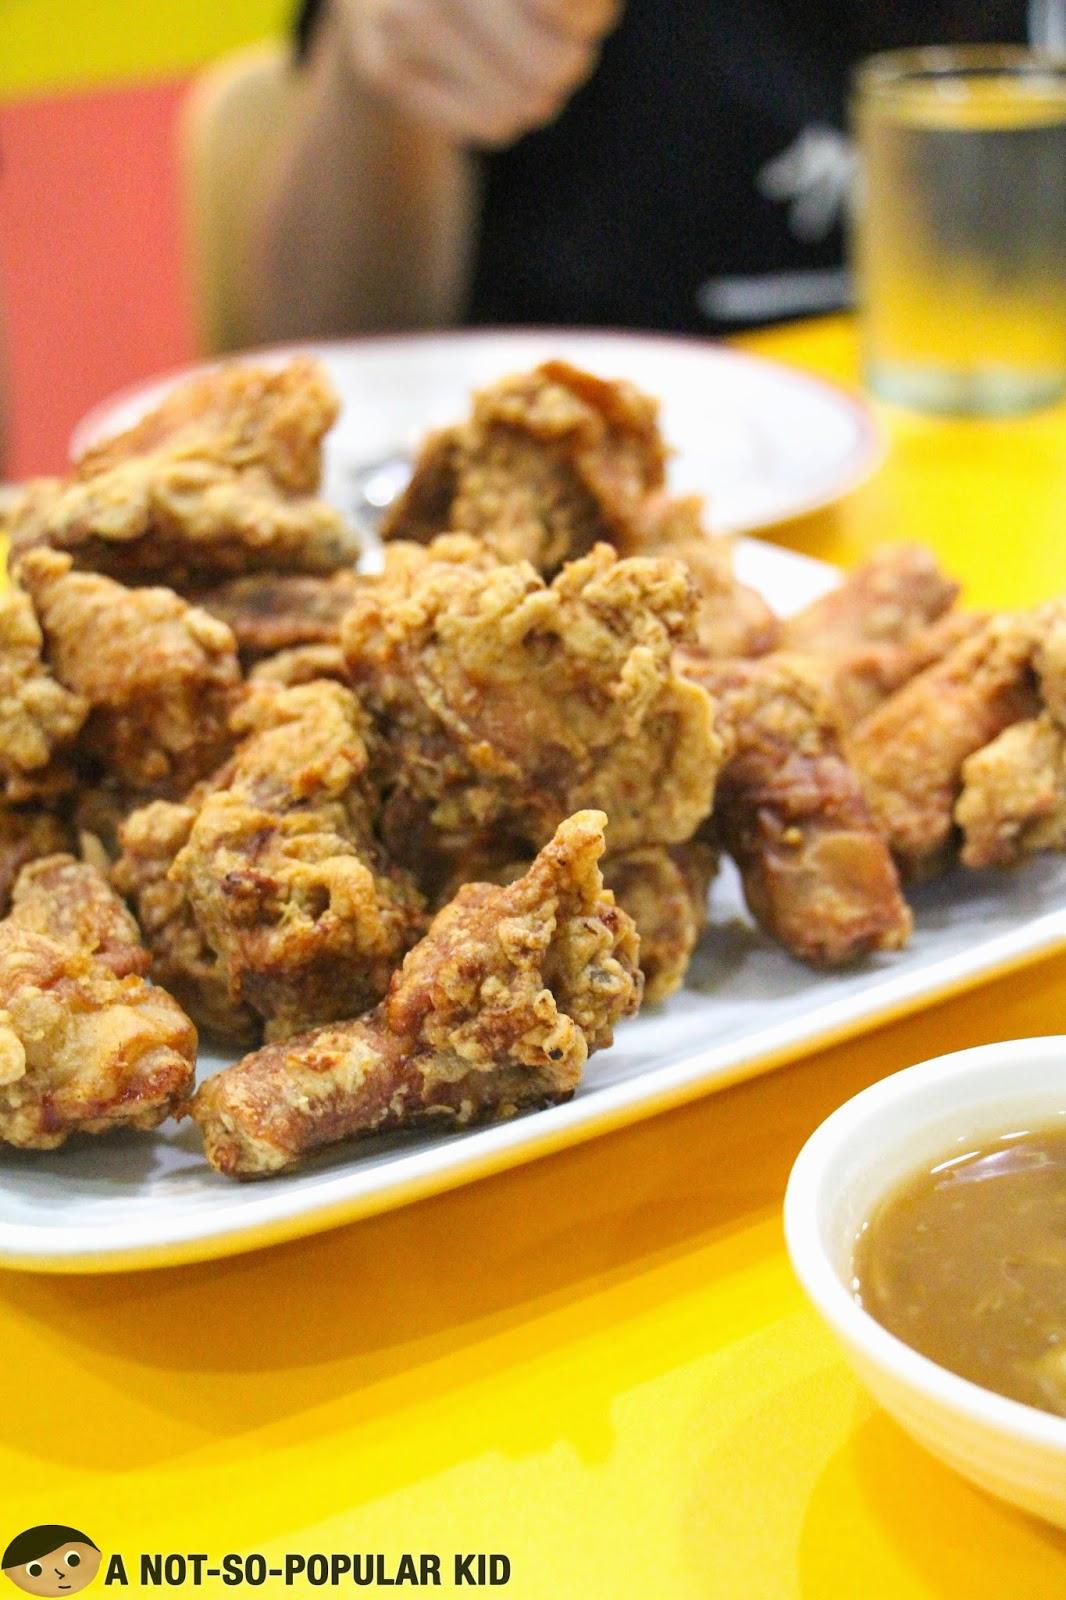 The Popular Chicken of Sincerity Restaurant